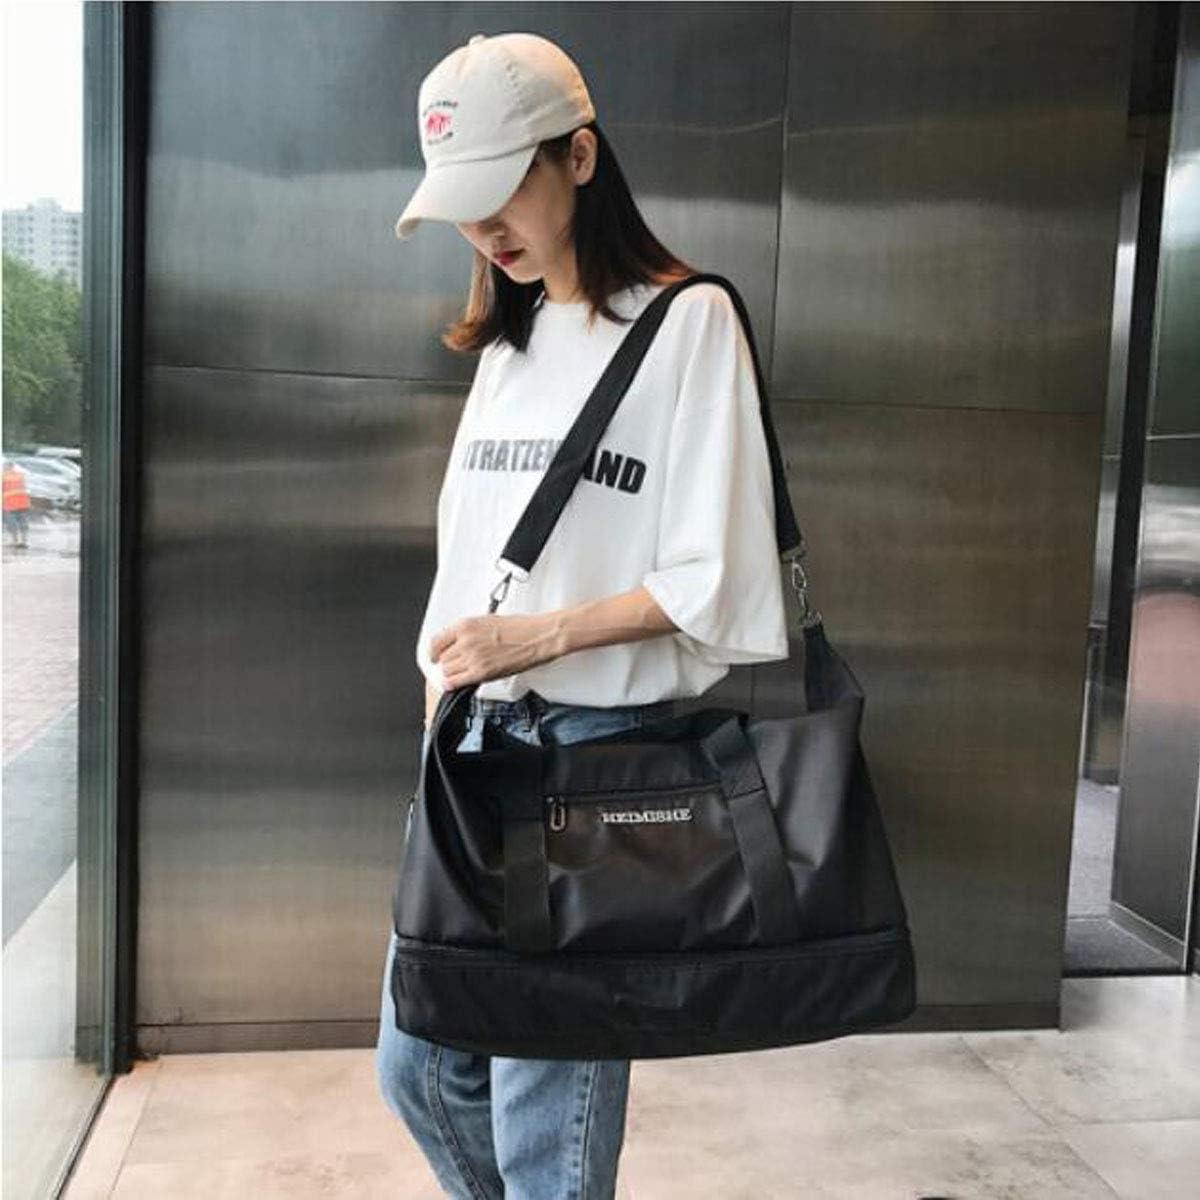 Kaiyitong Fitness Bag 2018 Practical Travel Bag Business Fashion Casual Fashion Bag Color : Pink Black Size: 452428cm